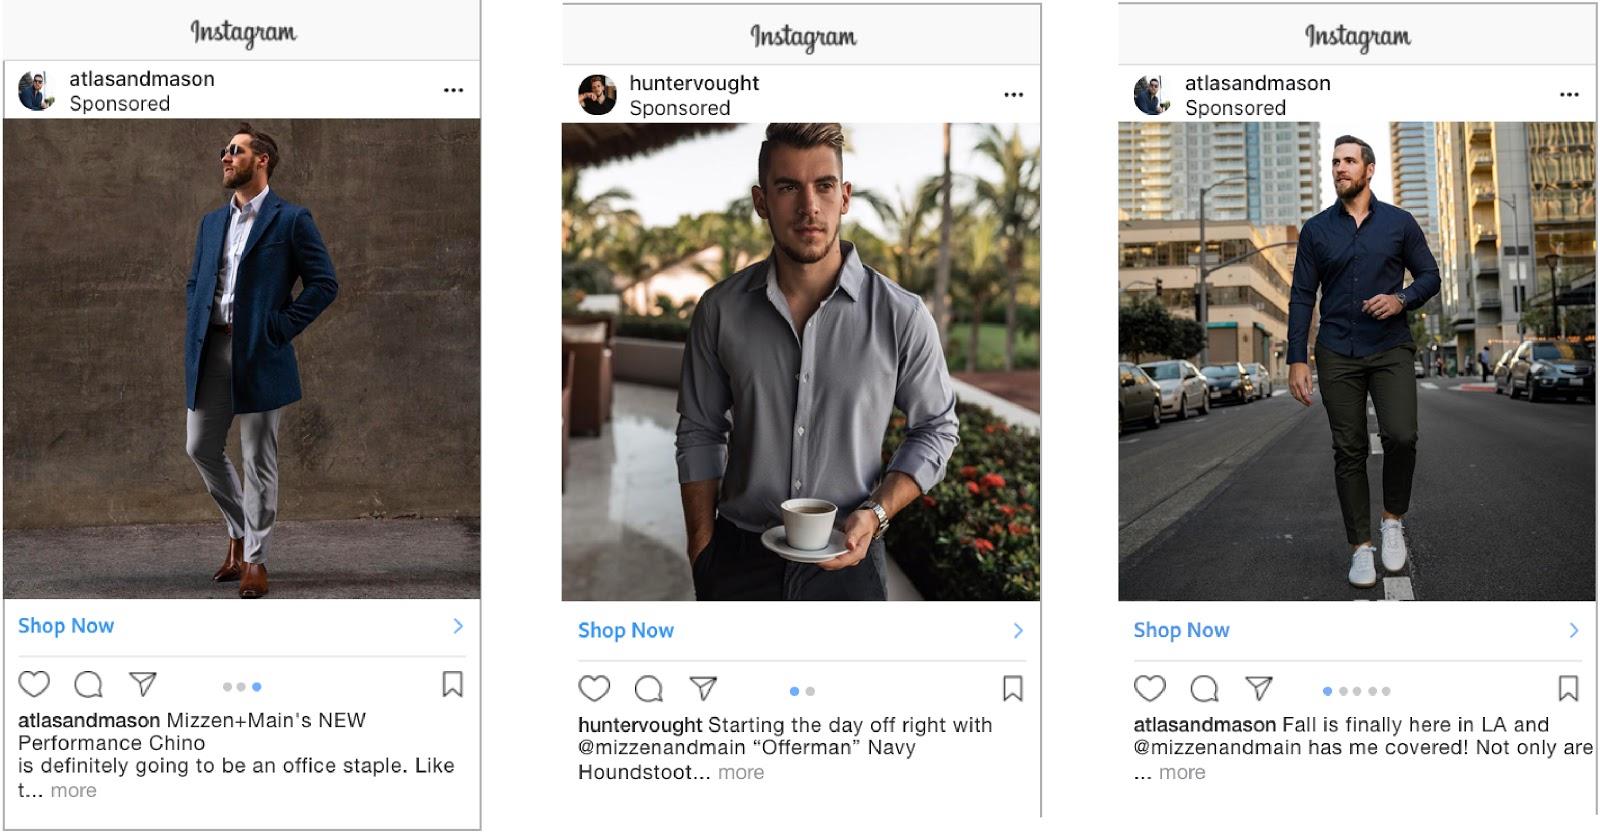 Examples of influencer dark posts